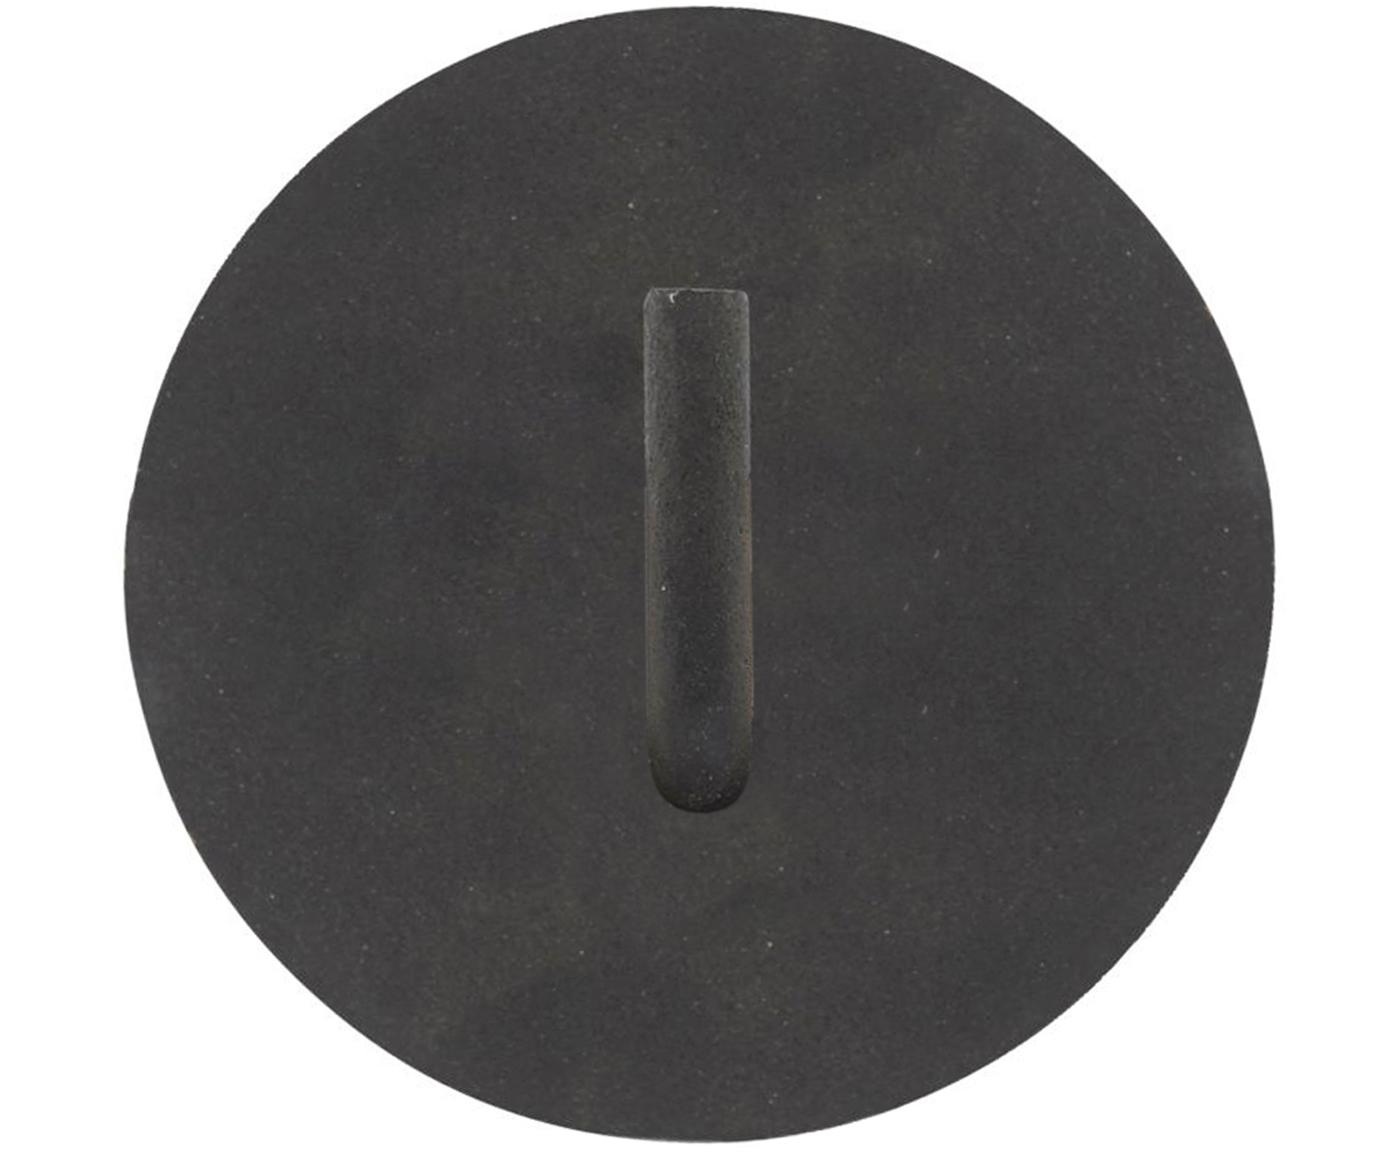 Hak ścienny z metalu Lema, Aluminium powlekane, Czarny, Ø 13 x G 12 cm